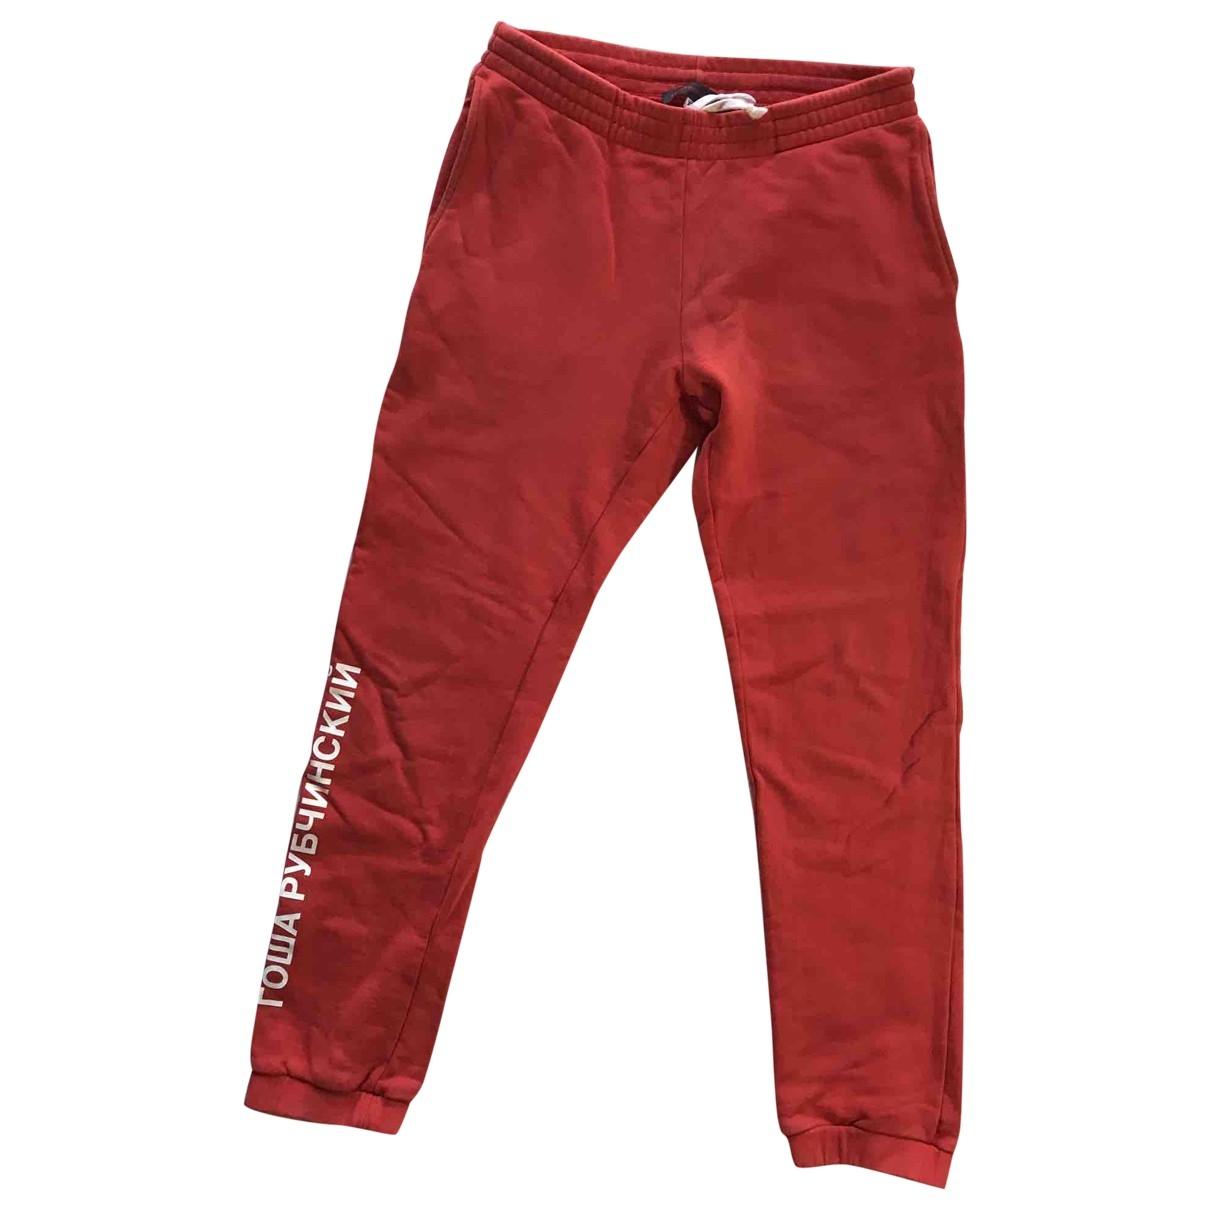 Gosha Rubchinskiy \N Red Cotton Trousers for Men XS International